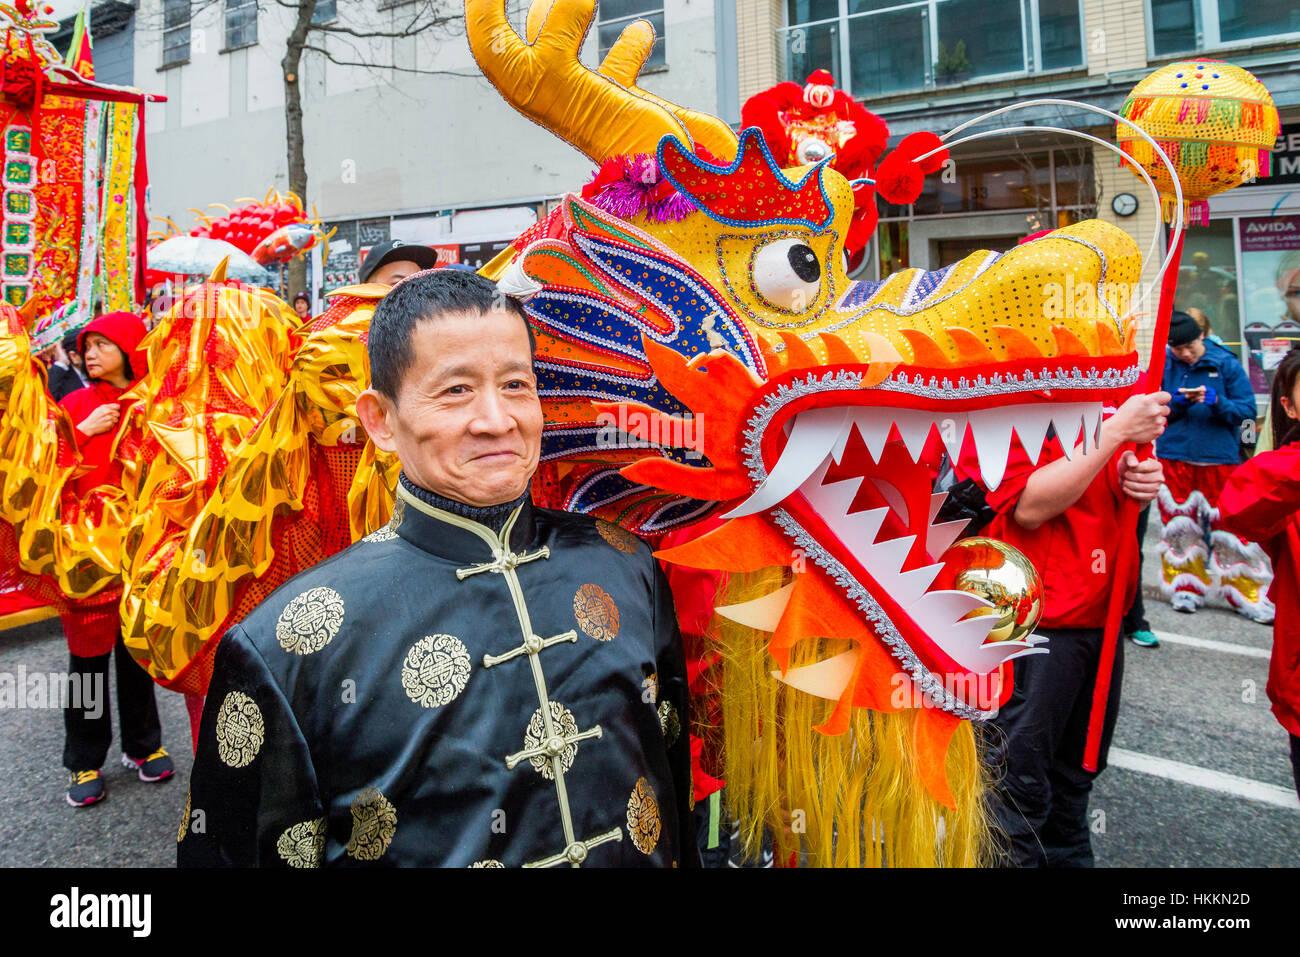 Vancouver, Kanada. 29. Januar 2017. Chinesisches Neujahr parade ...